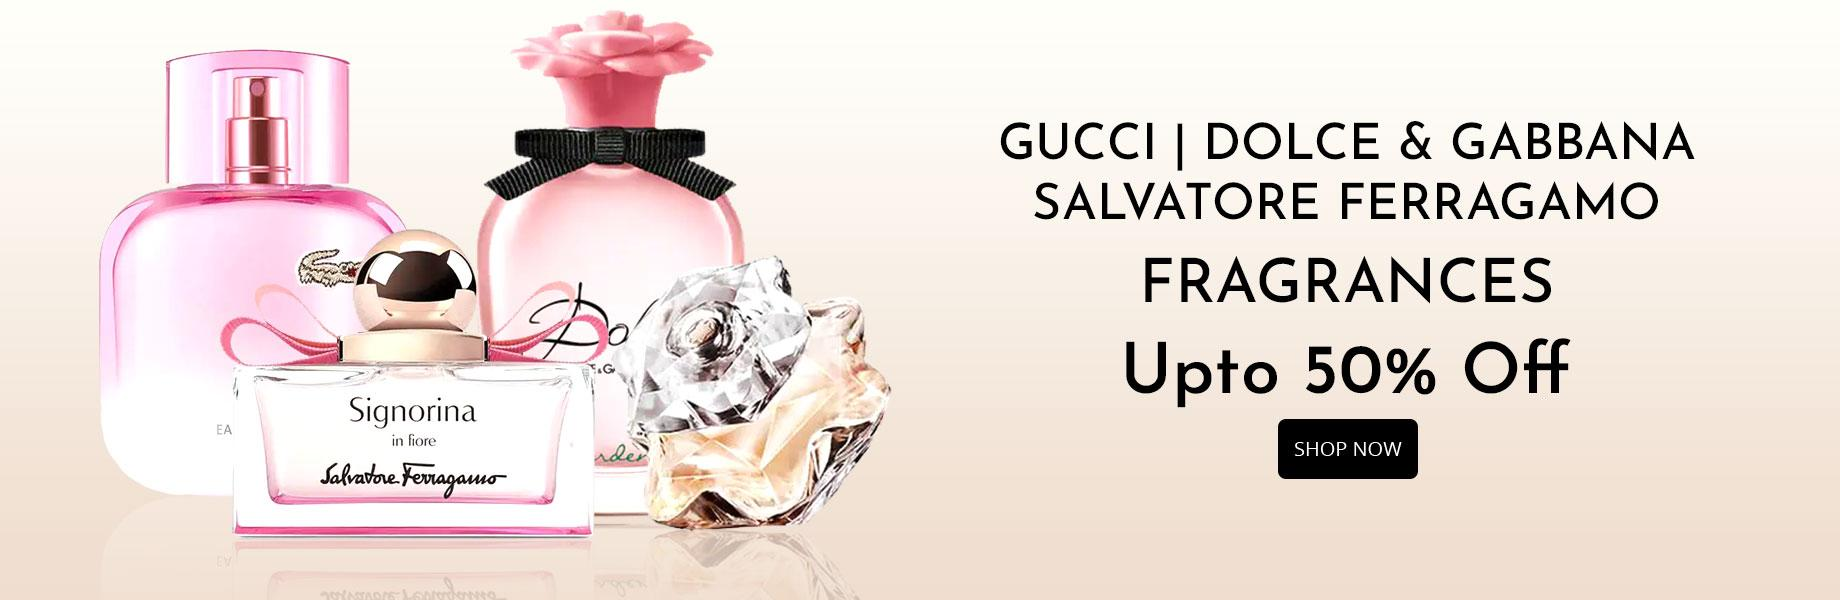 Homepage-Carousal-Fragrances-Web.jpg